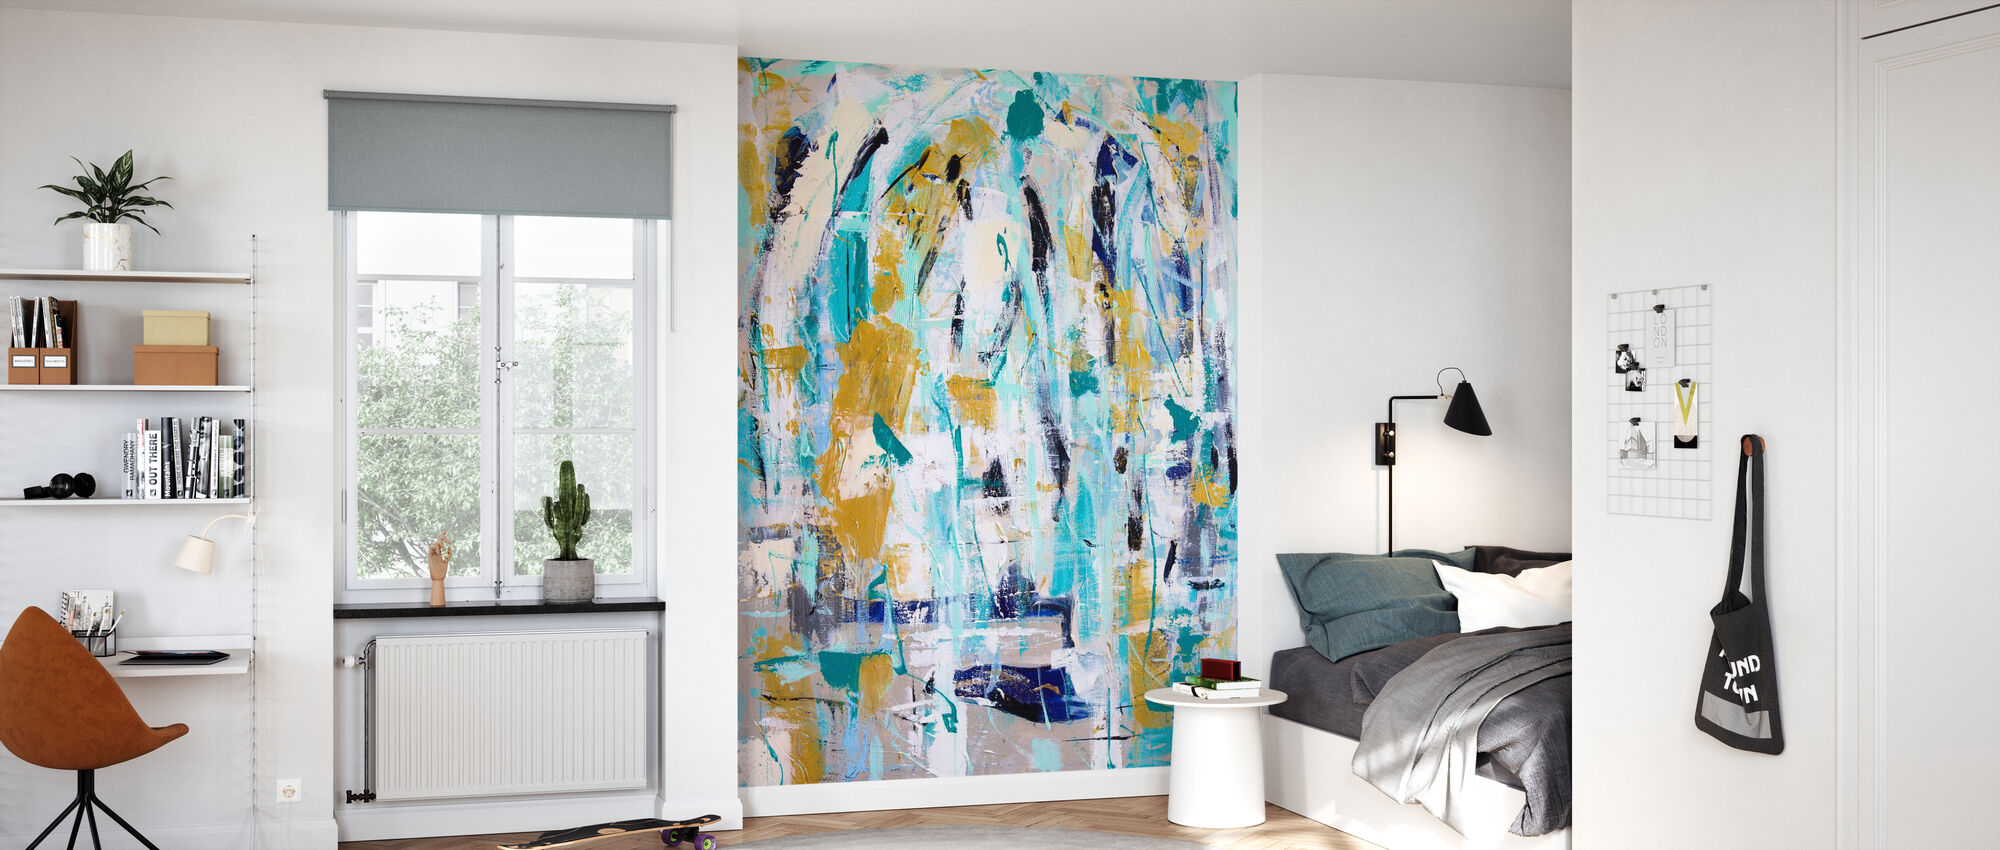 Rain can be so Refreshing - Wallpaper - Kids Room